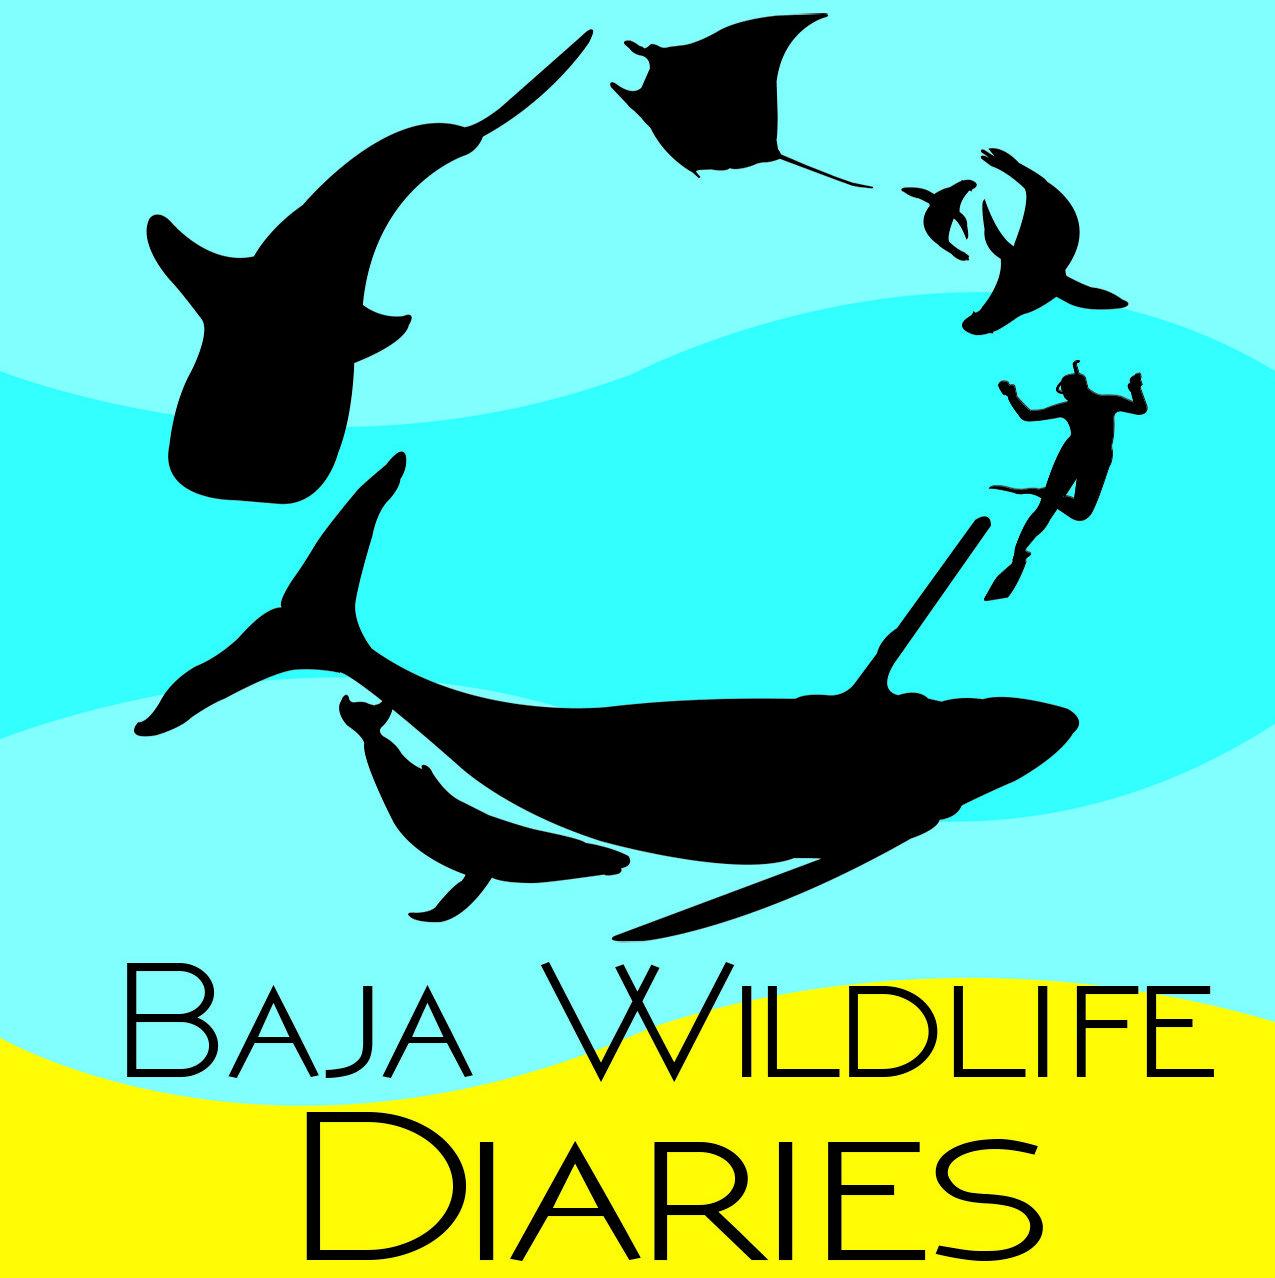 Baja Wildlife Diaries